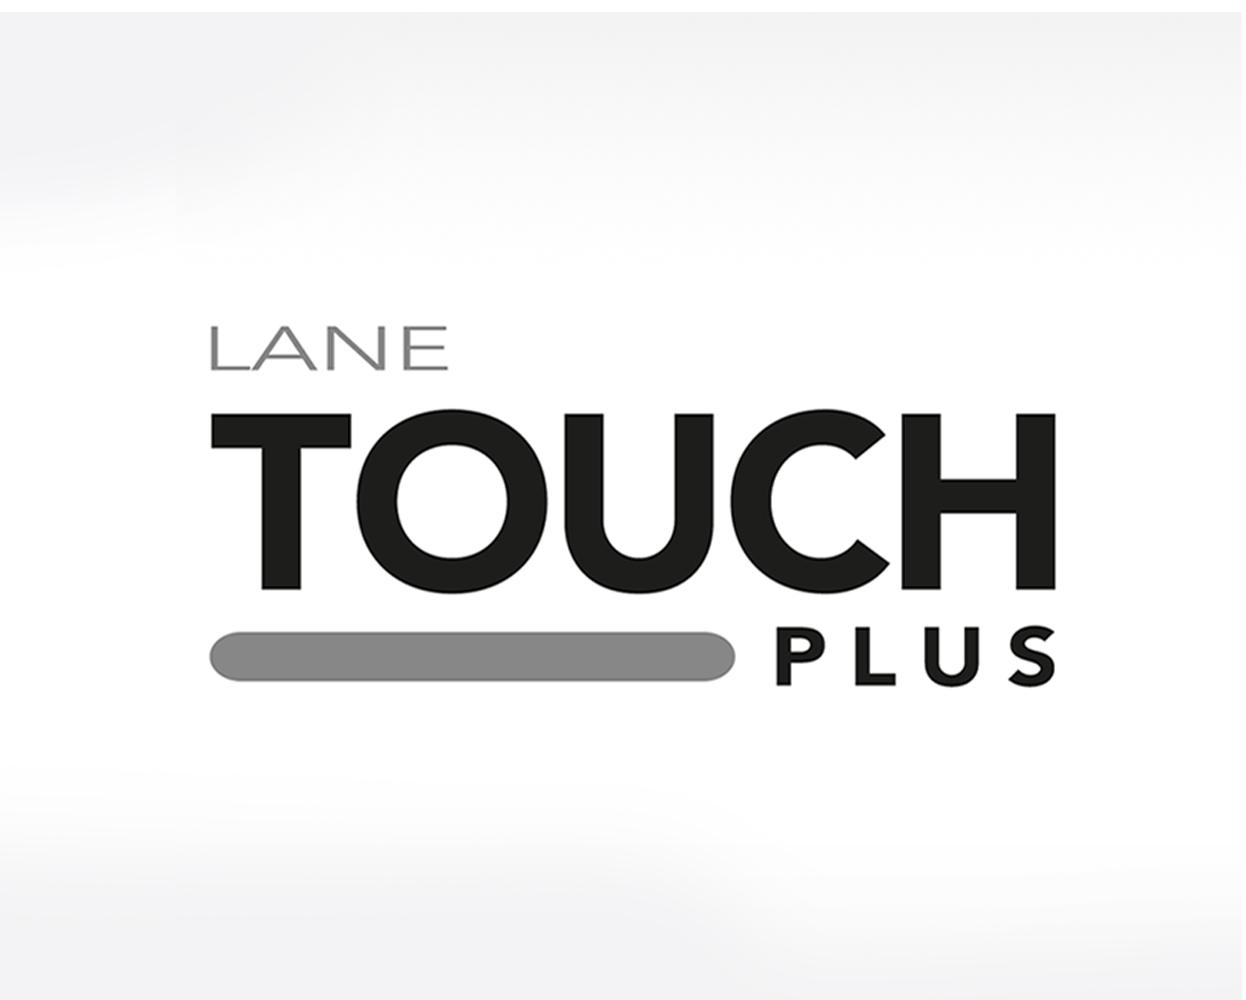 Lane Touchplus logo